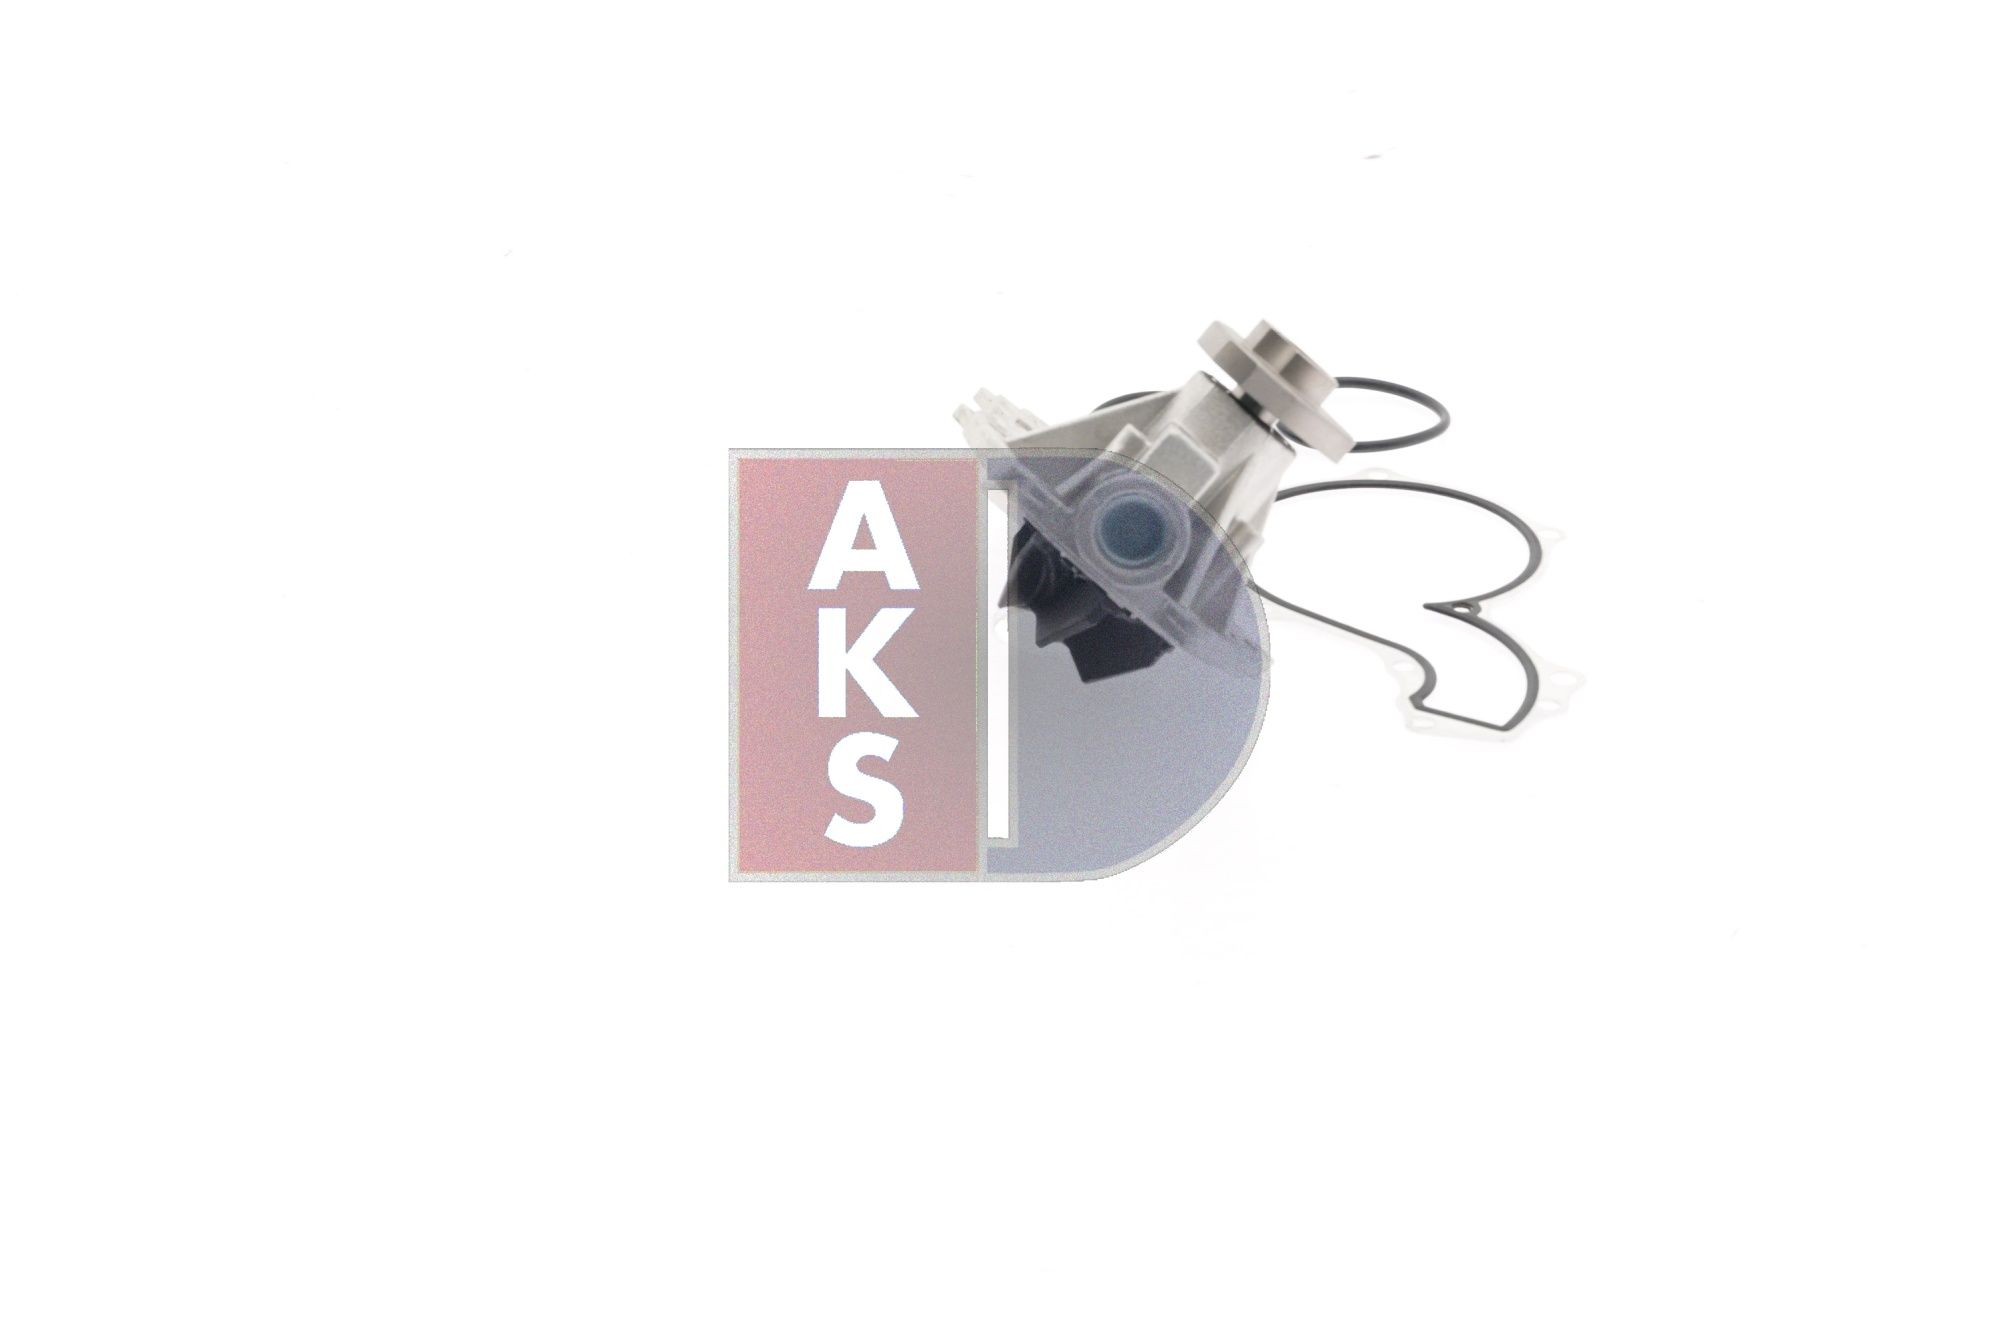 570004N Kühlmittelpumpe AKS DASIS in Original Qualität